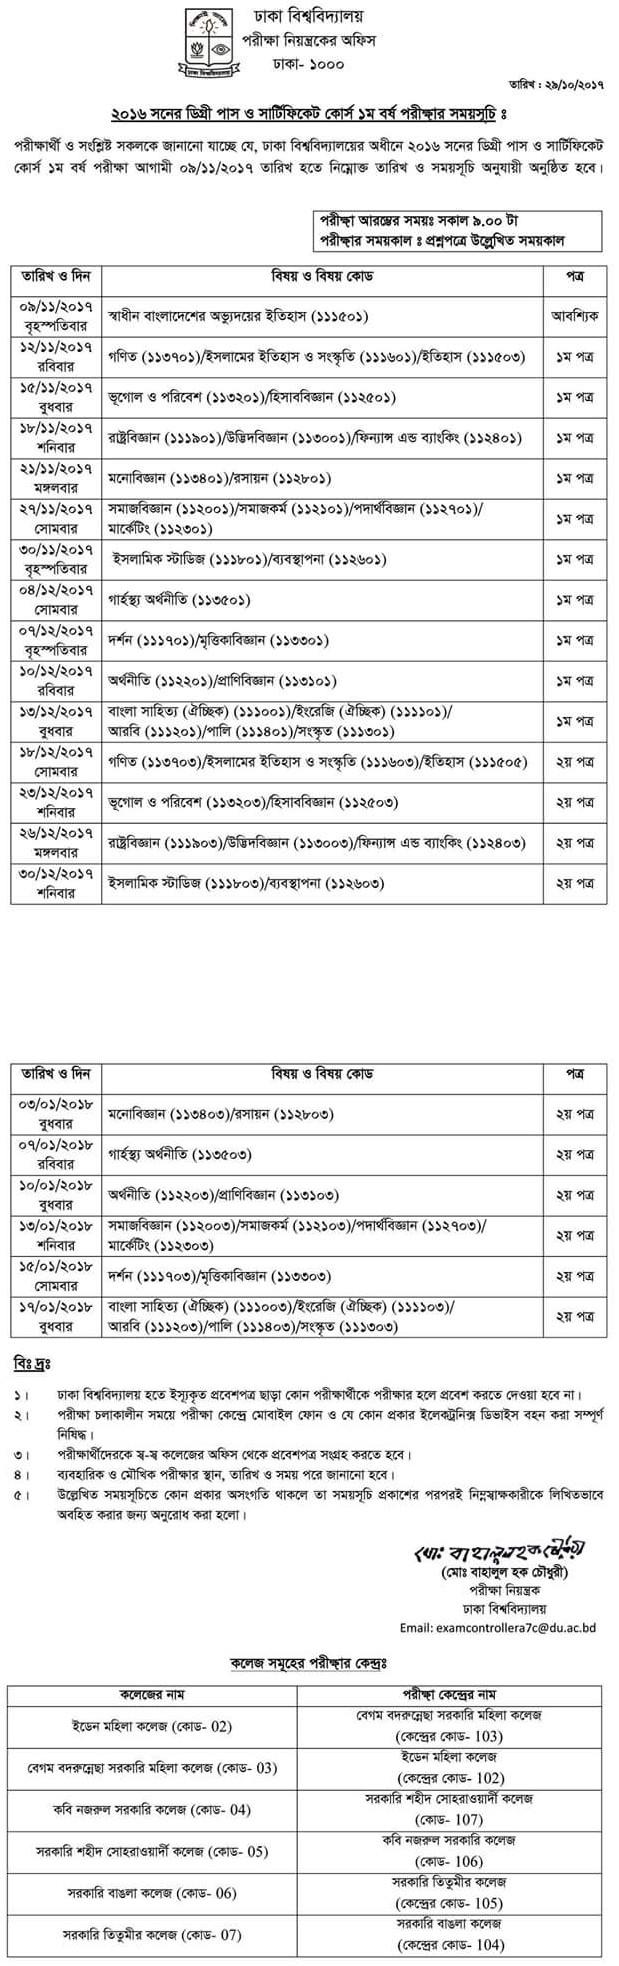 DU 7 College Degree 1st Year Exam Routine 2017 PDF File